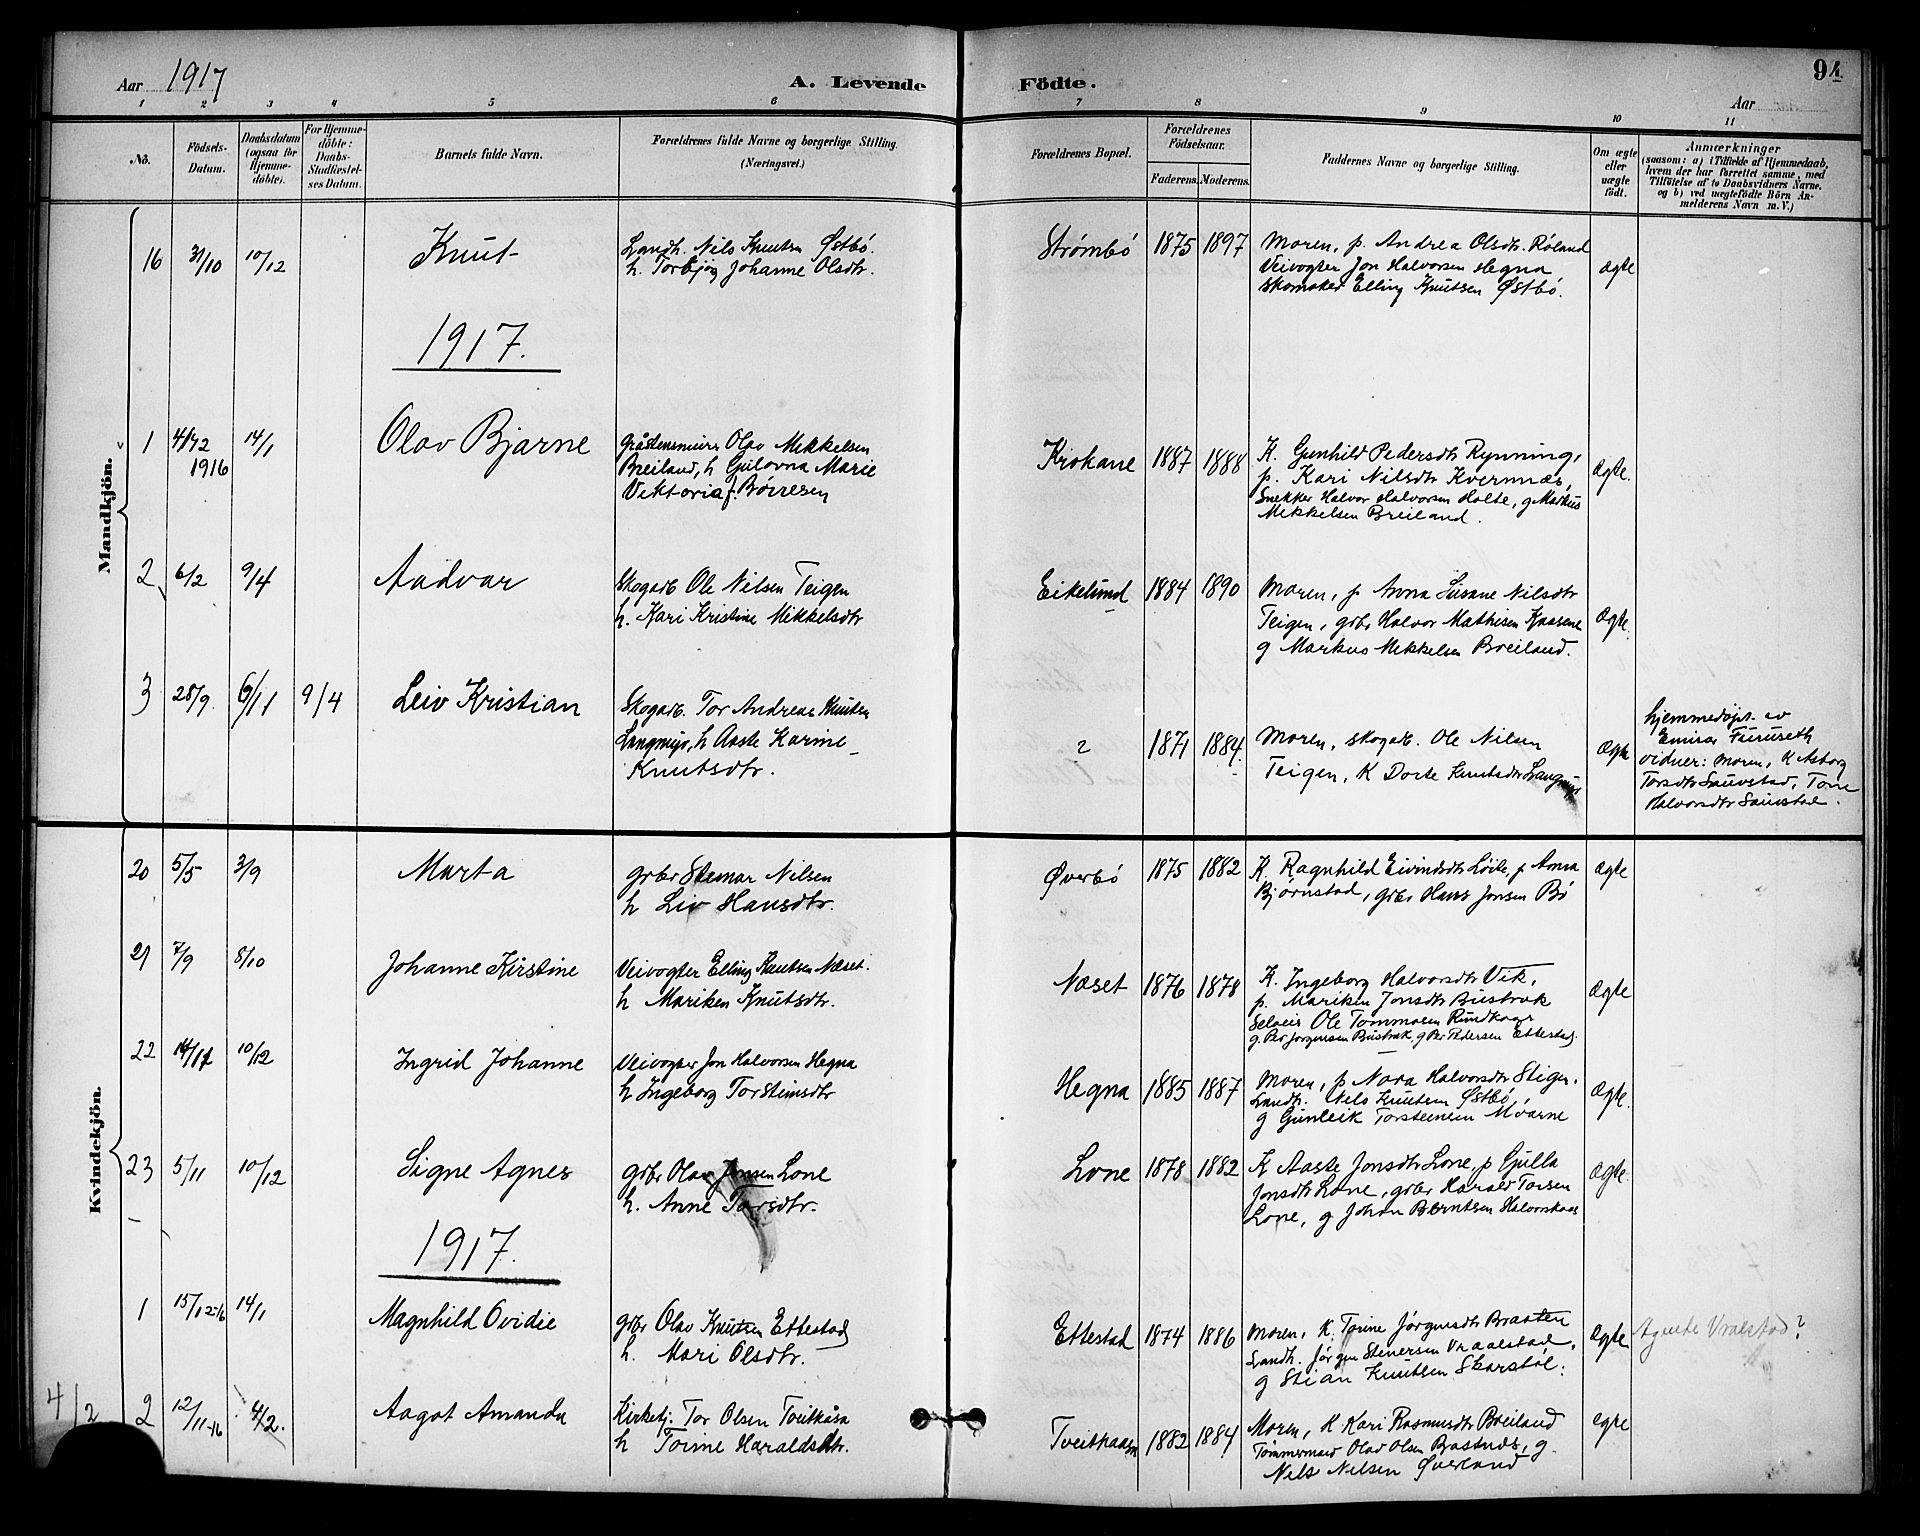 SAKO, Drangedal kirkebøker, G/Gb/L0002: Klokkerbok nr. II 2, 1895-1918, s. 94